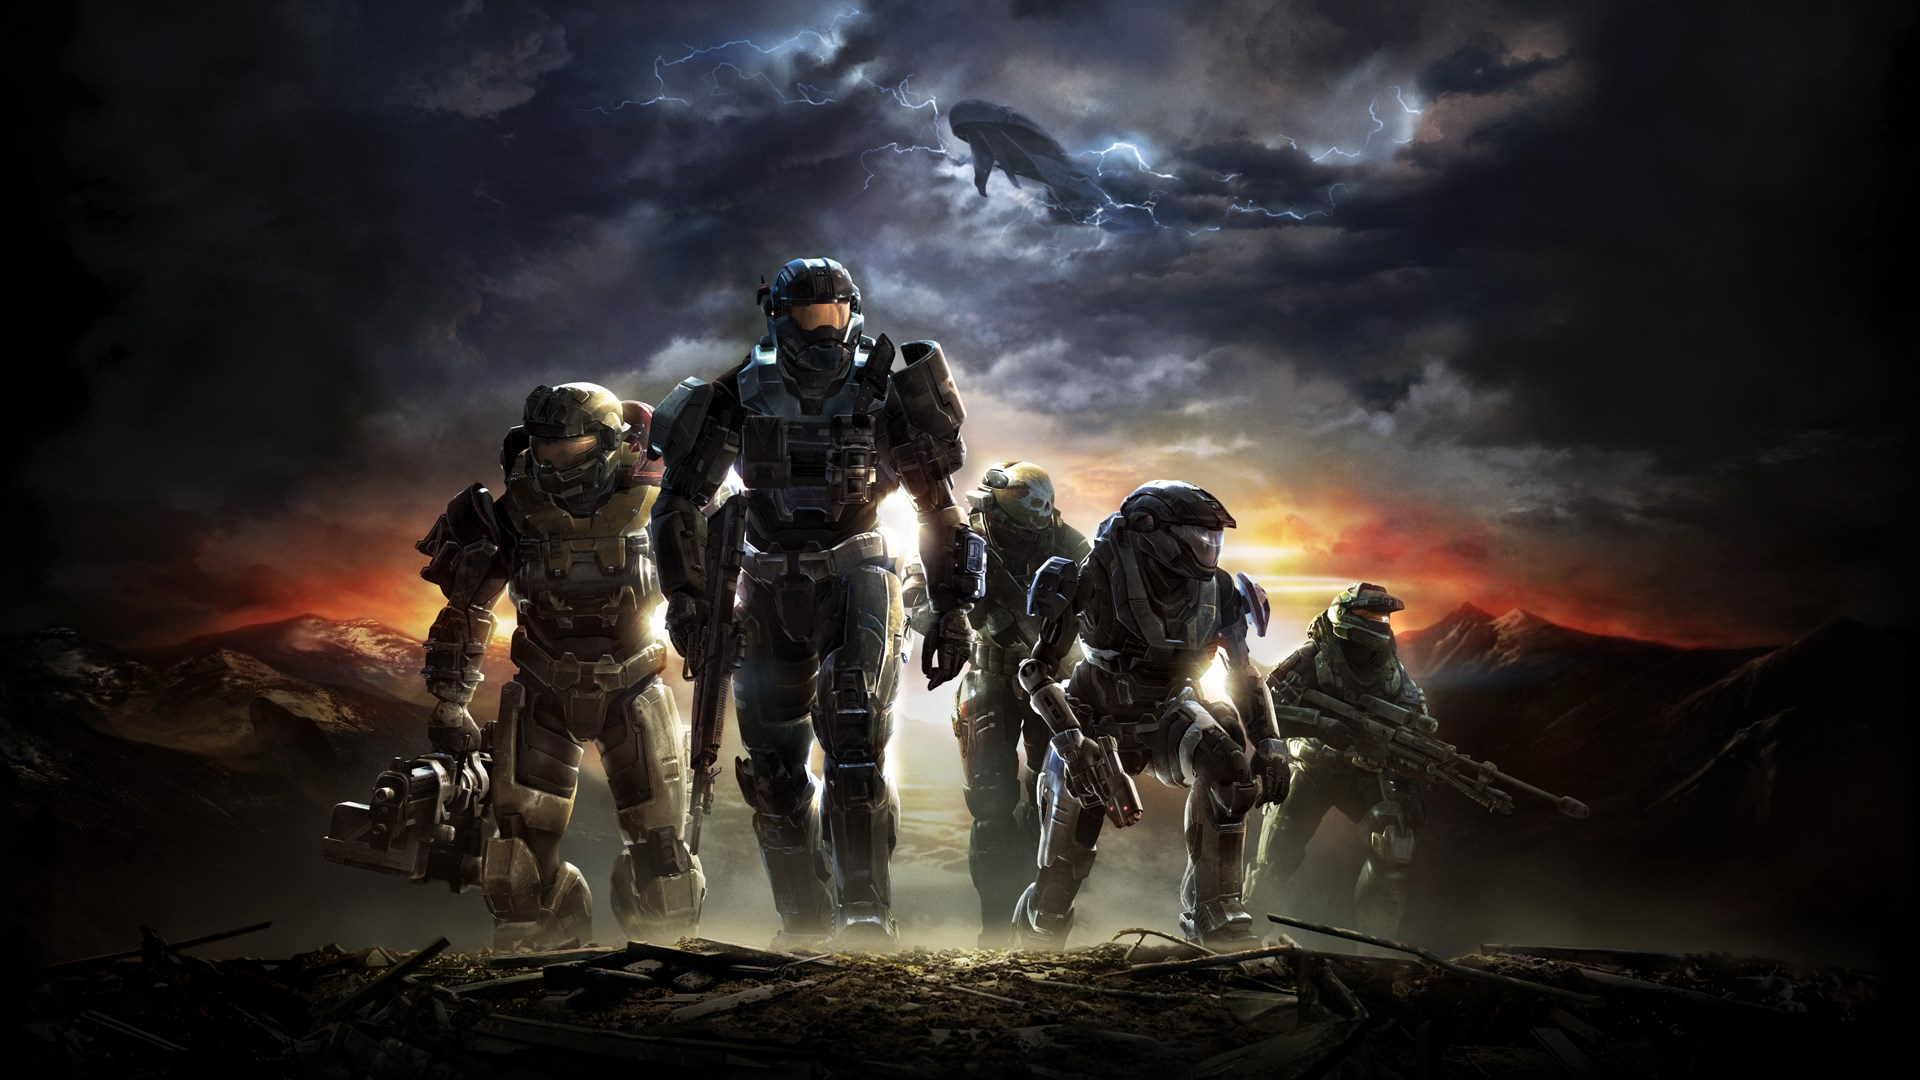 Buy Pre-Order Bonus Armor - Microsoft Store